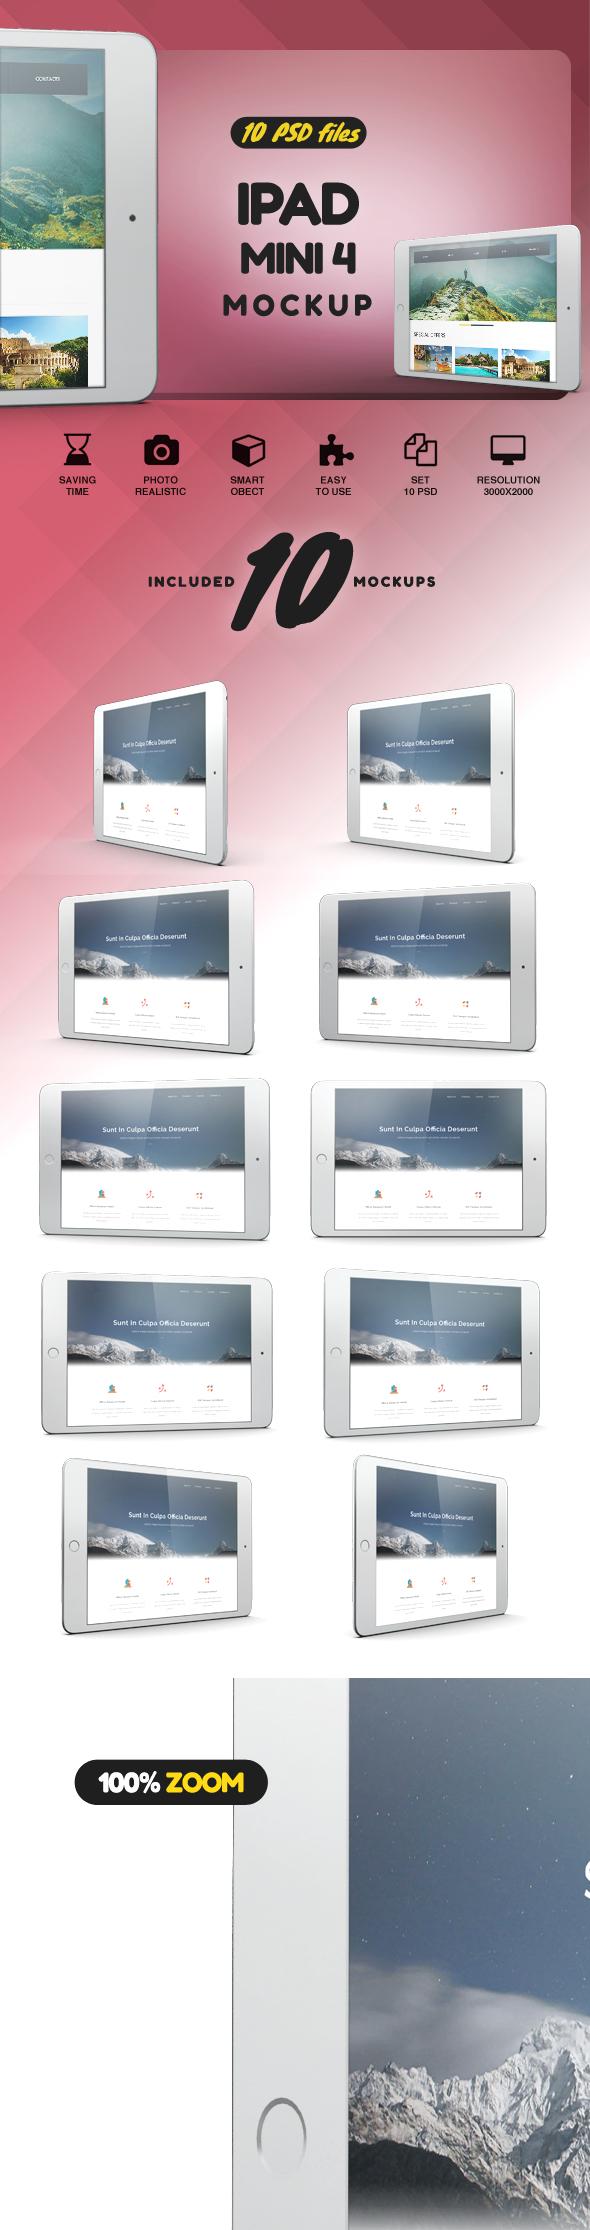 iPad Mini 4 Mockup example image 2